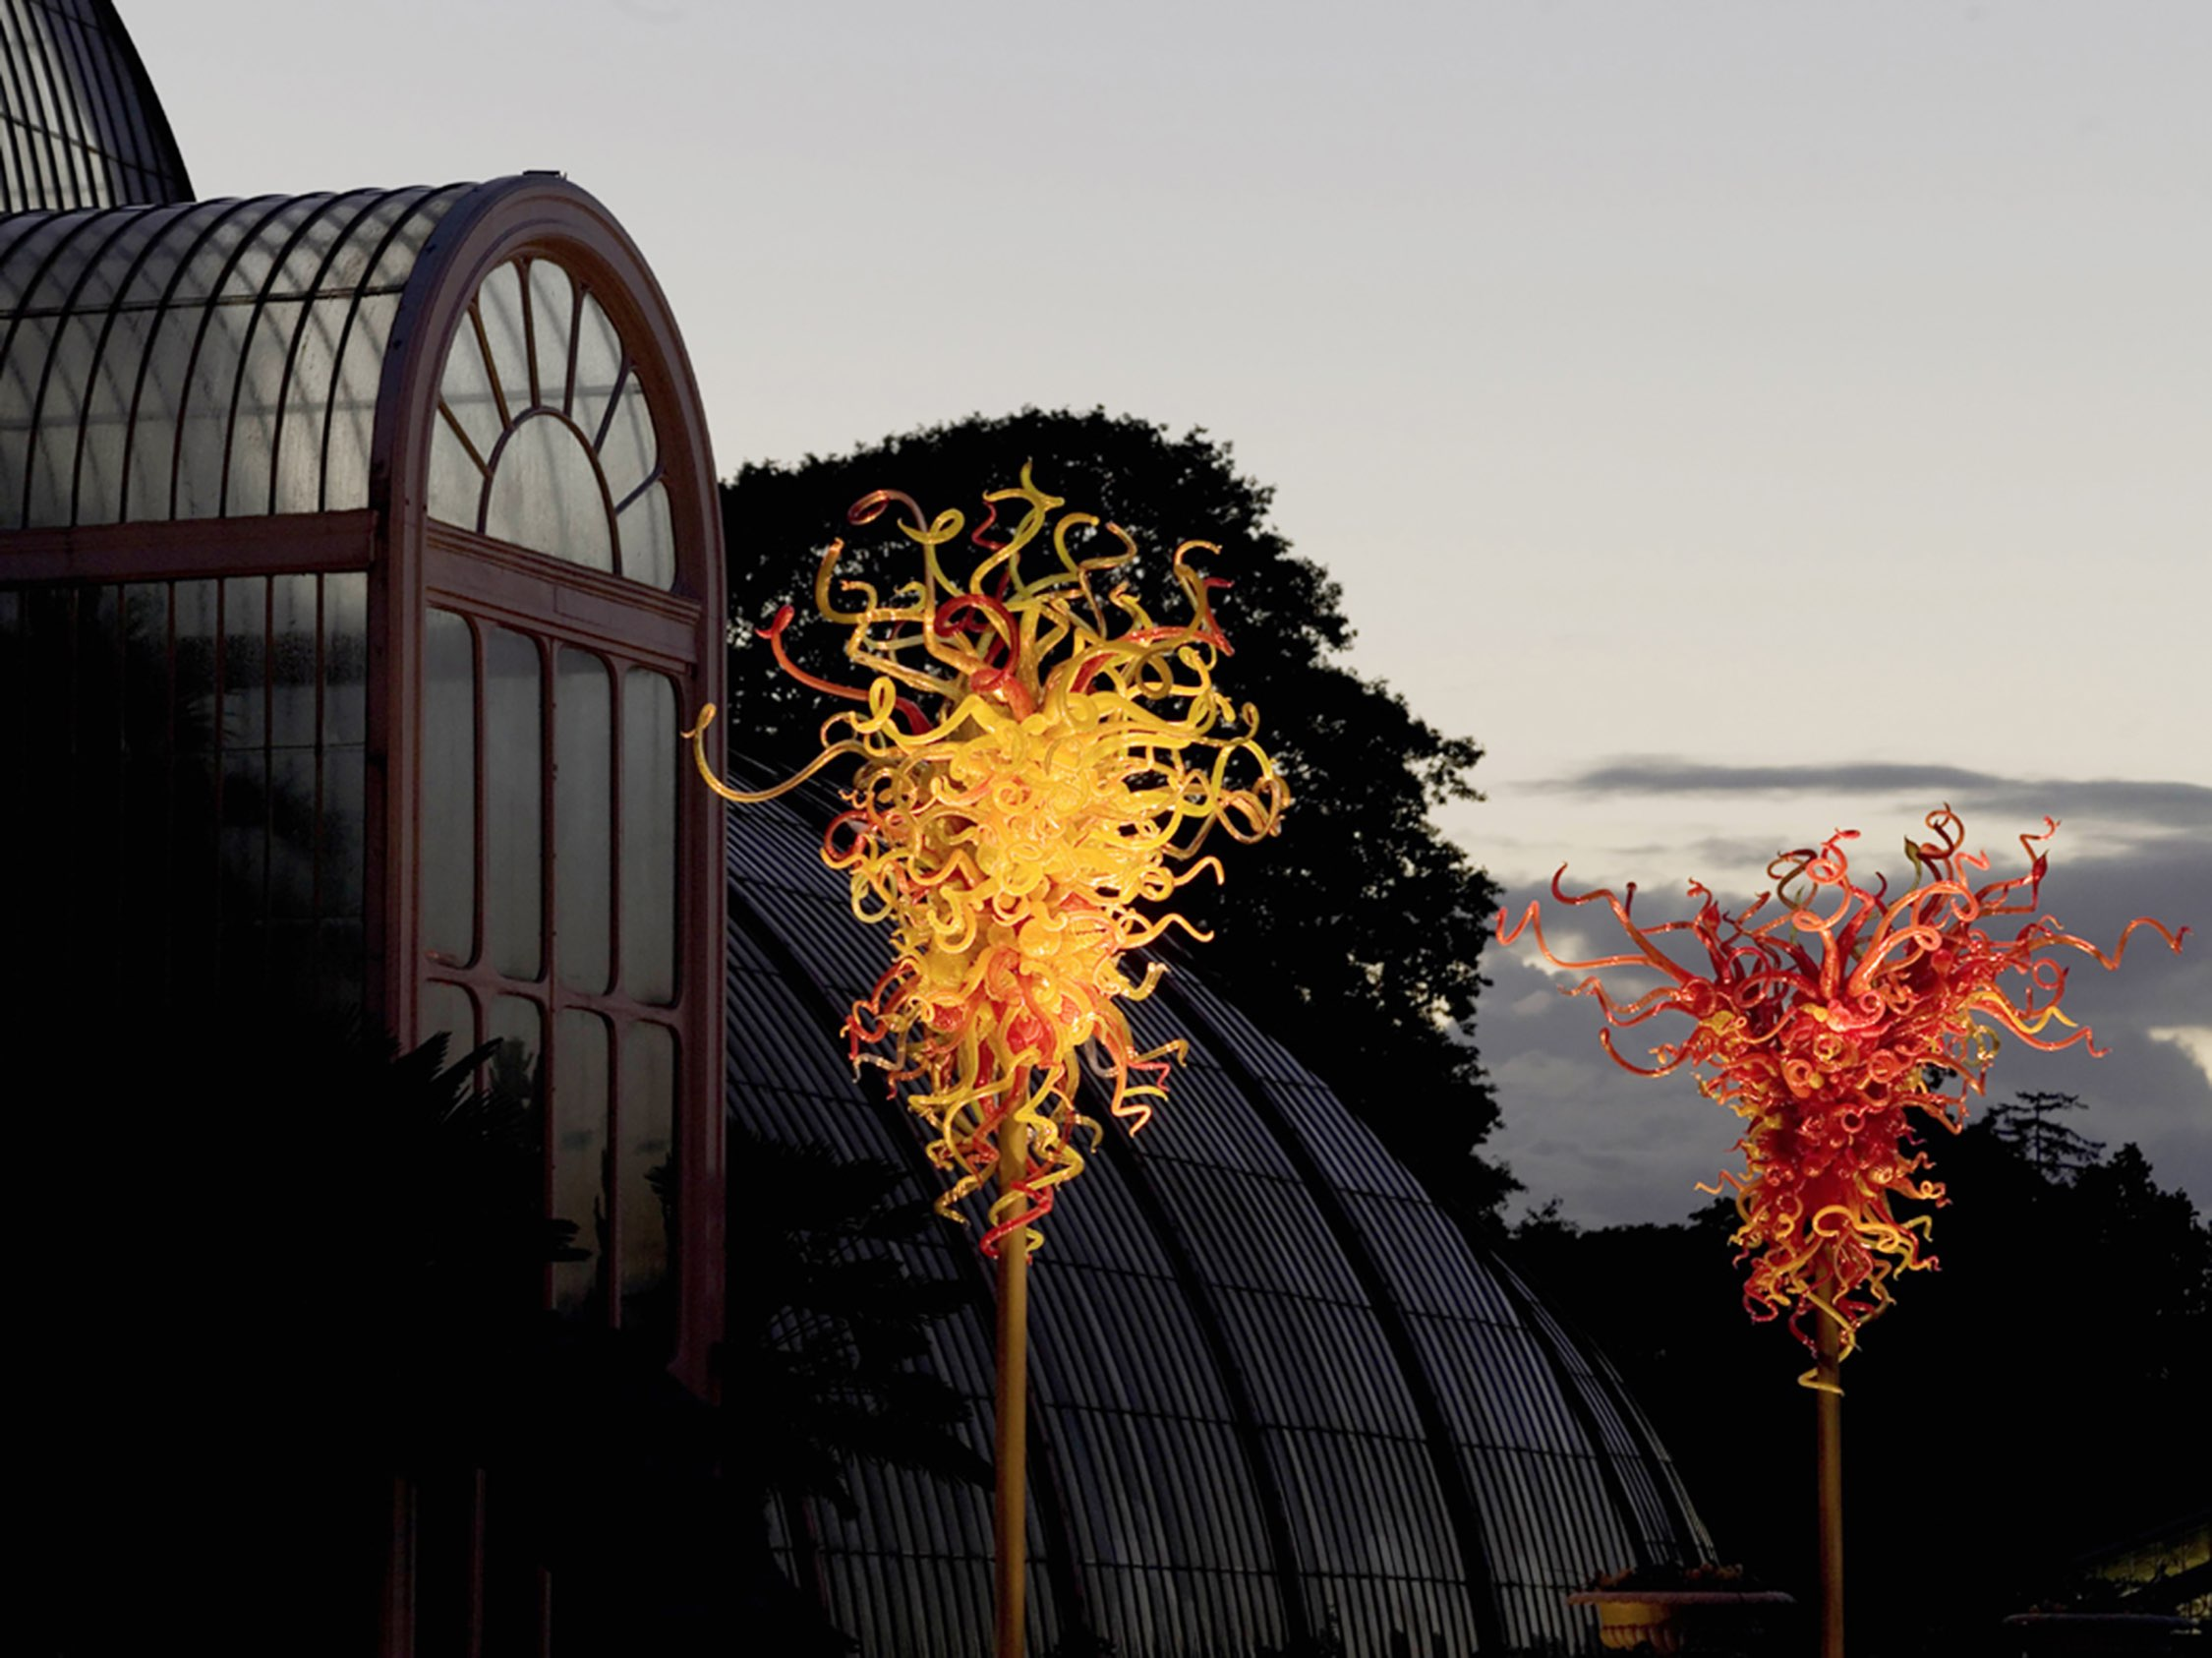 Royal-Botanical-Gardens-Studio-LUX-2